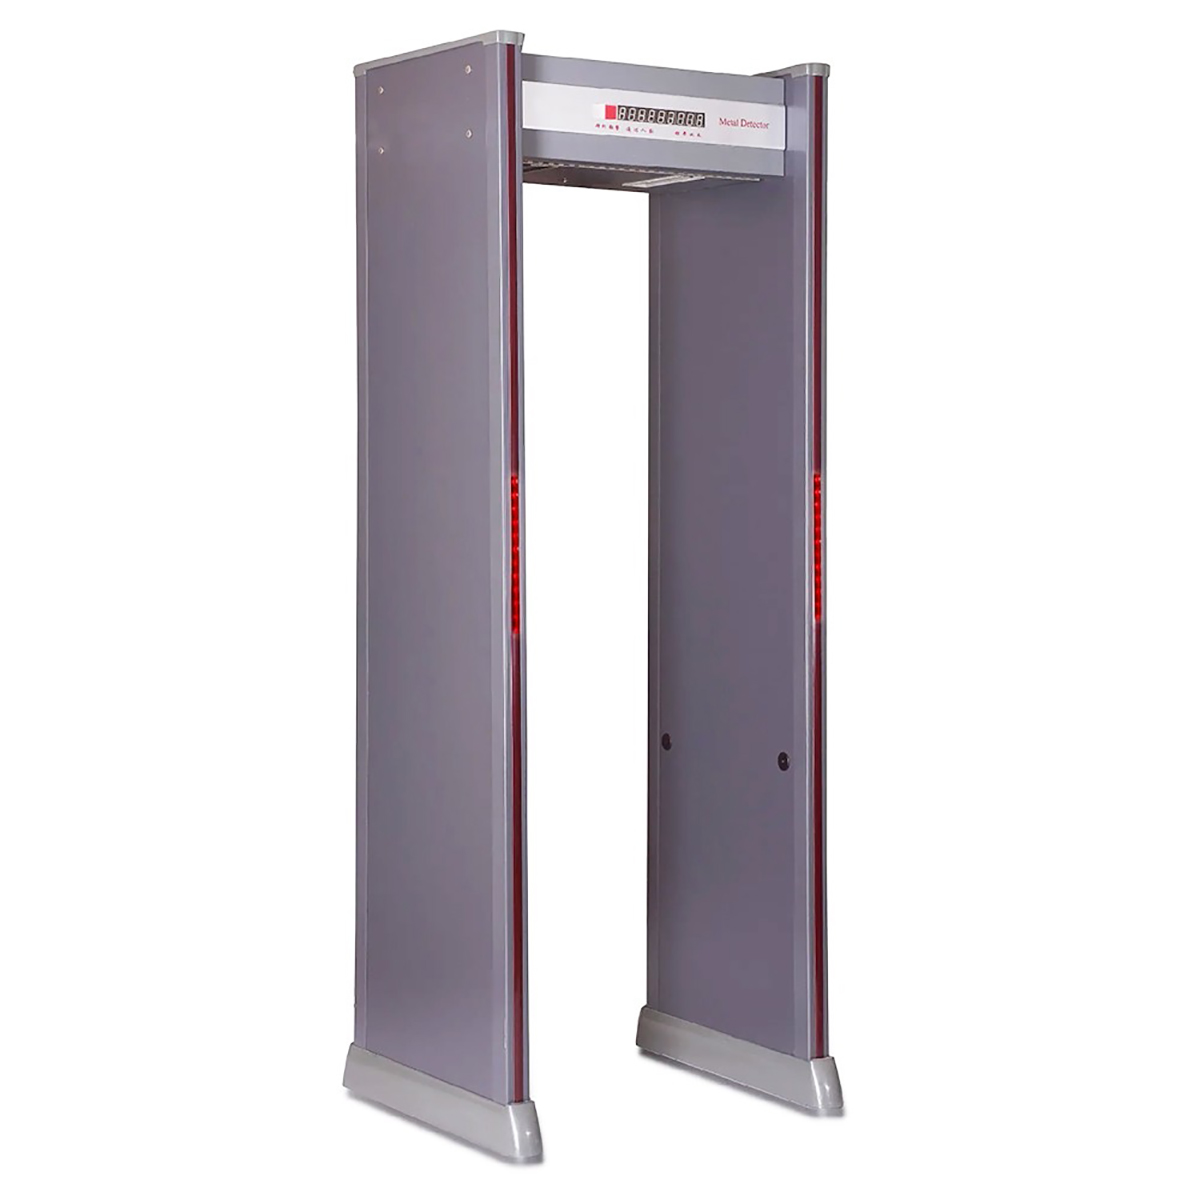 633E High Sensitivity Archway Metal Detector, Walk Through Metal Detector